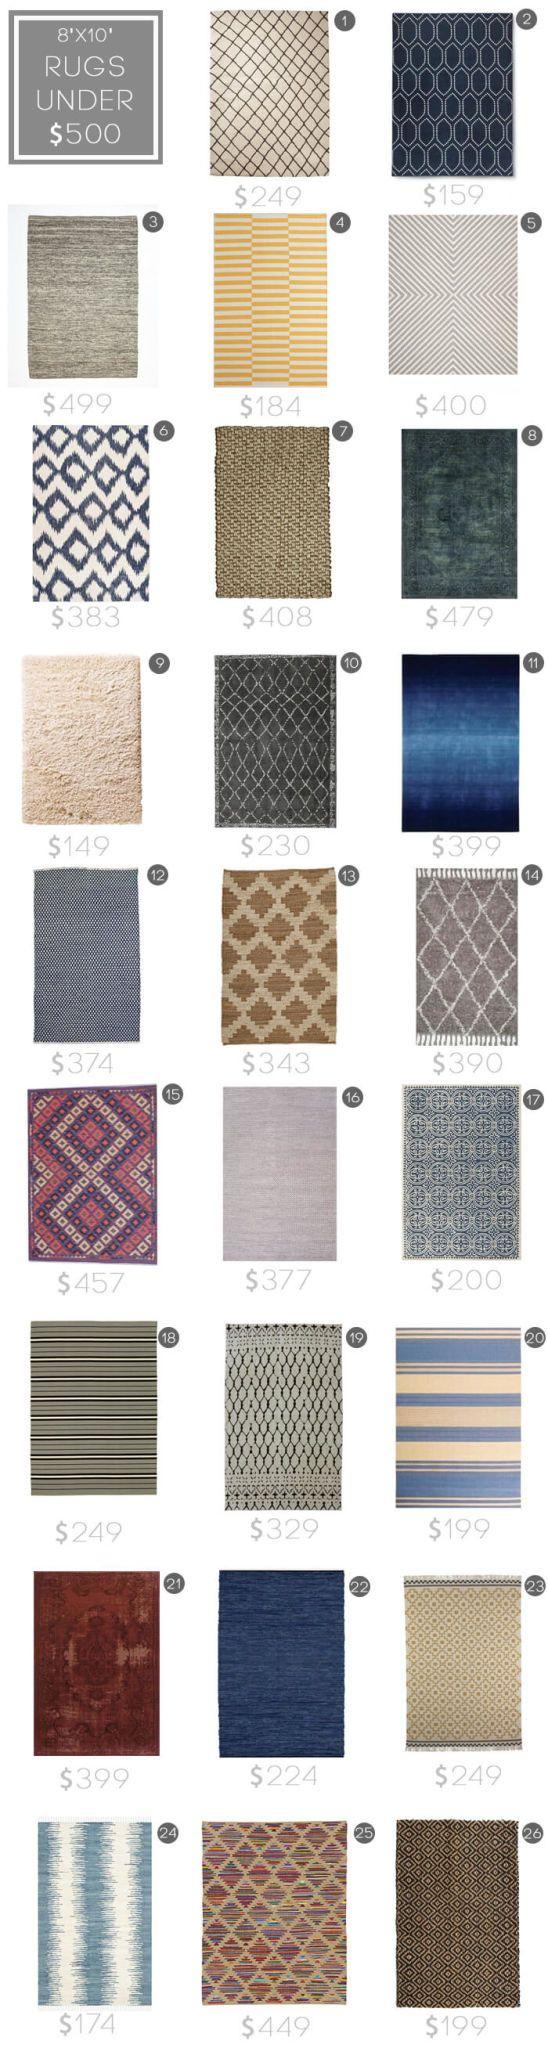 Emily Henderson Design blog.  8x10 (or larger) rugs under $500.  Source:  https://stylebyemilyhenderson.com/blog/design-mistake-2-the-too-small-rug/